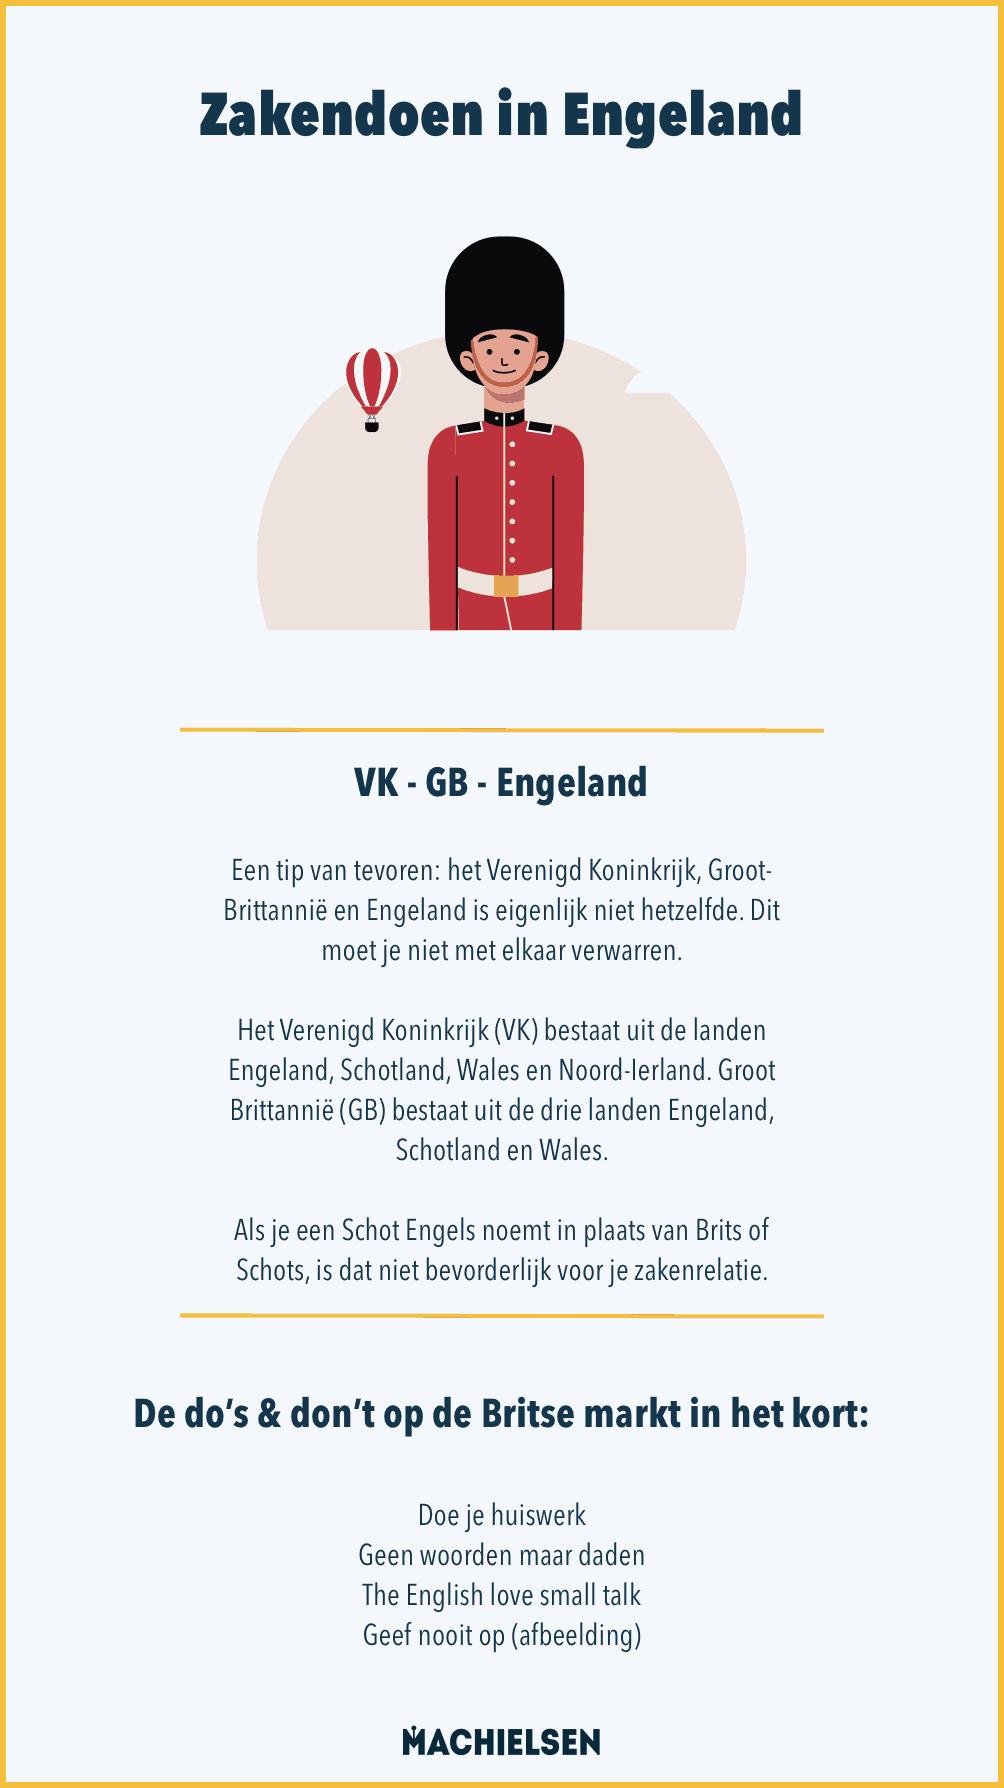 infographic zakendoen Engeland